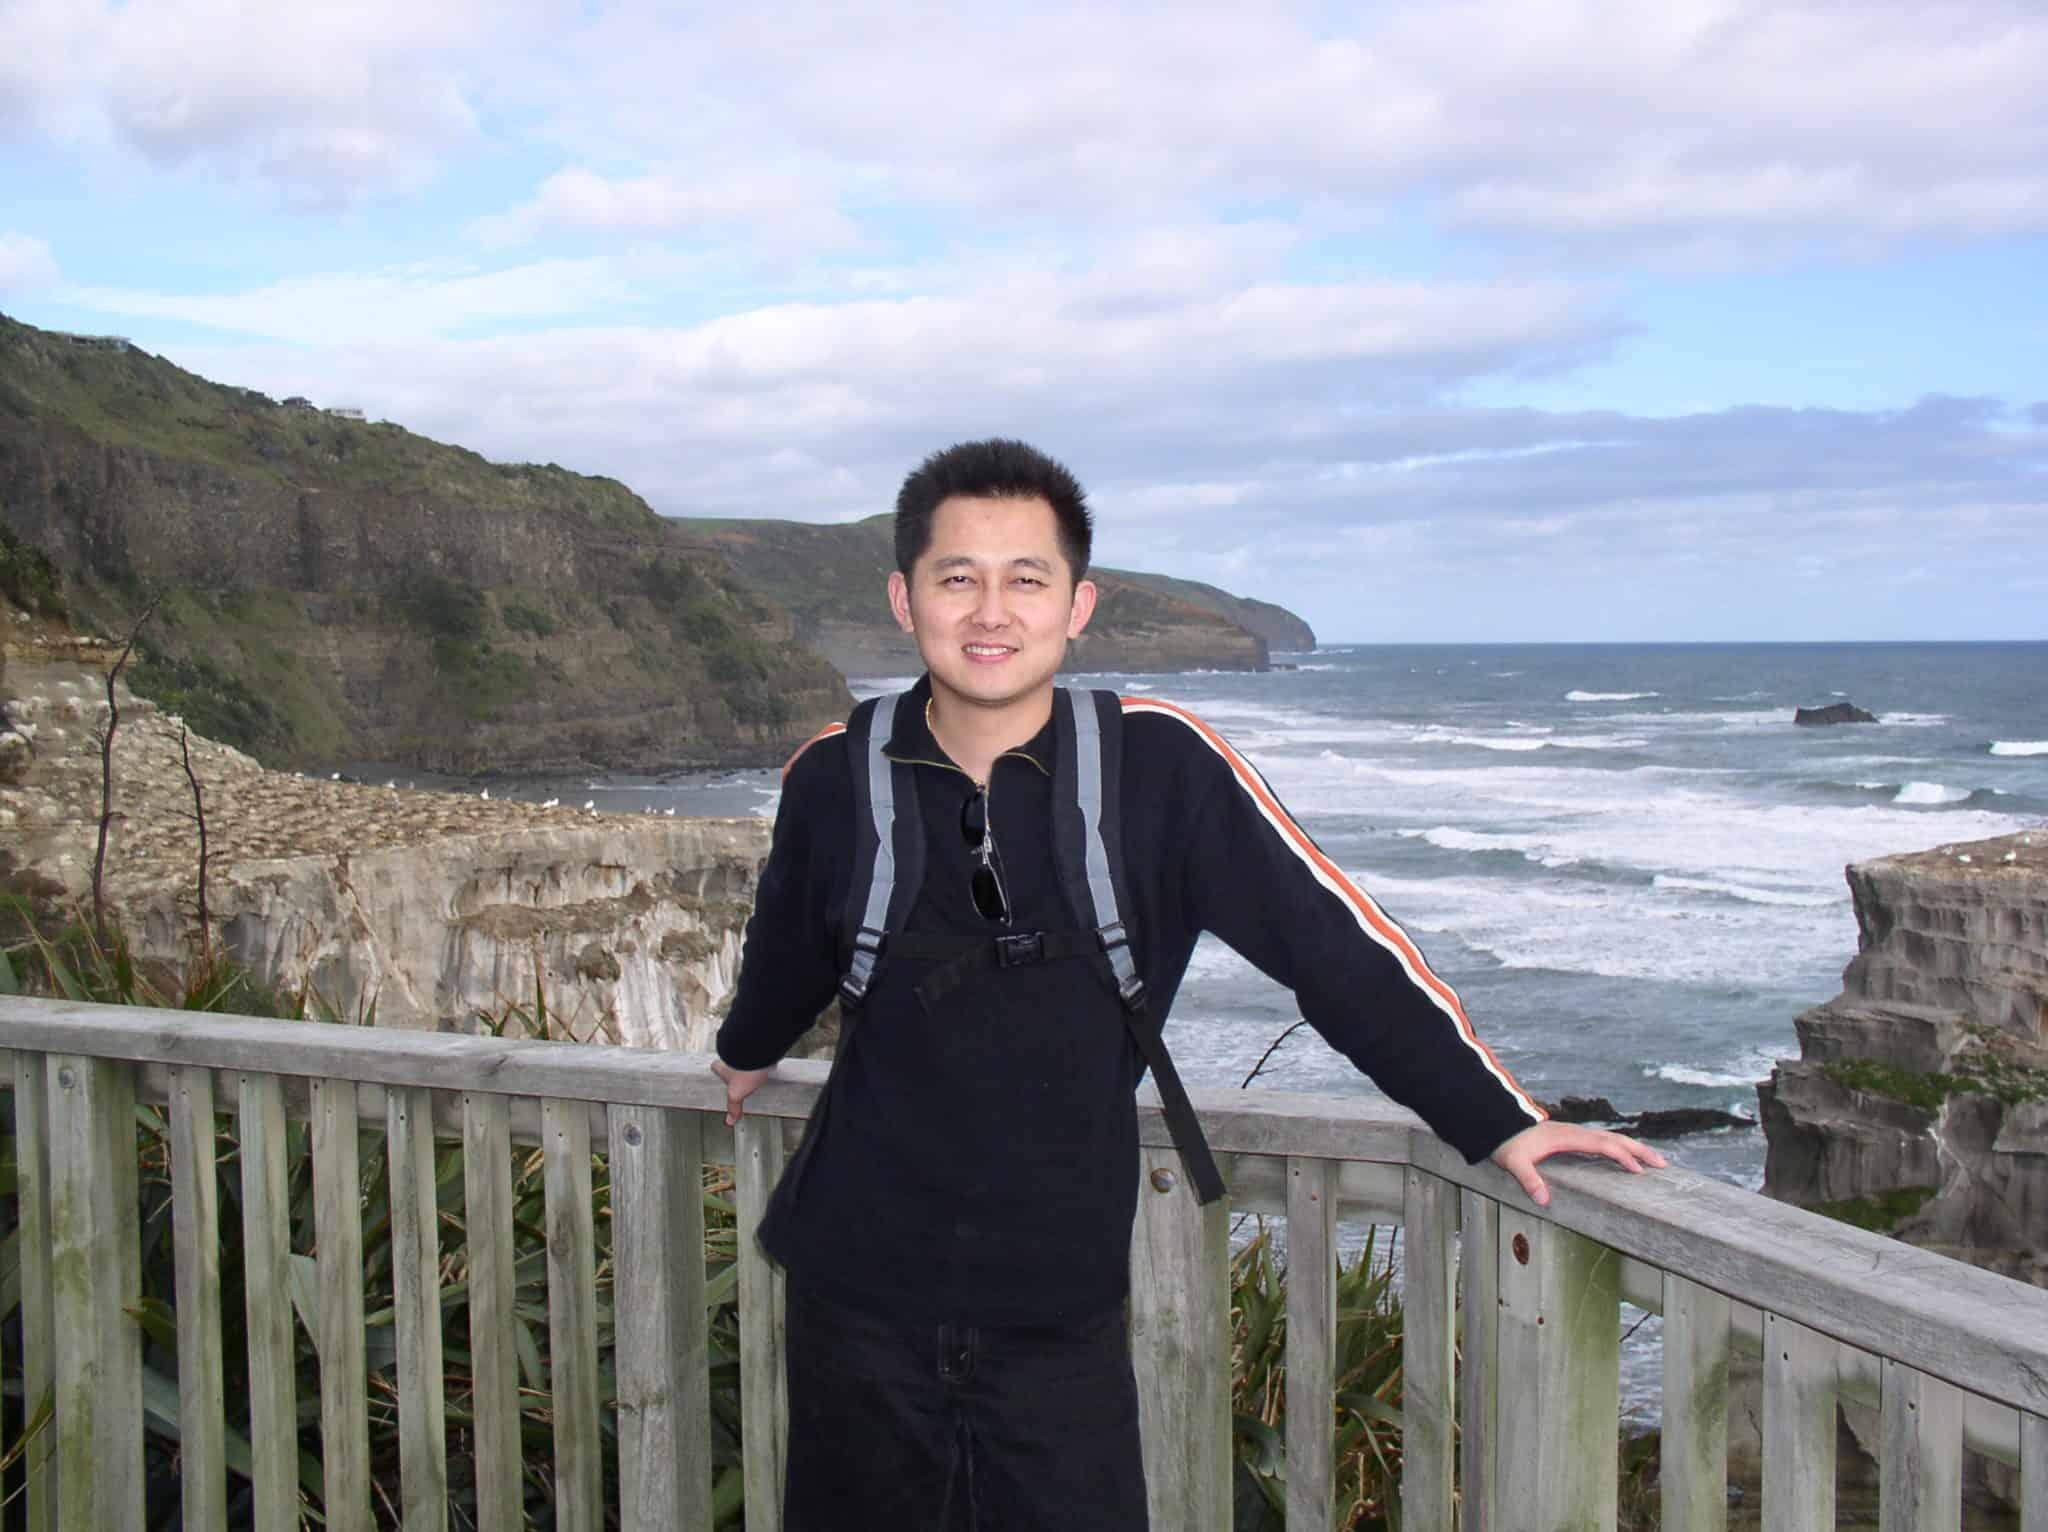 @ NZ Muriwai Beach